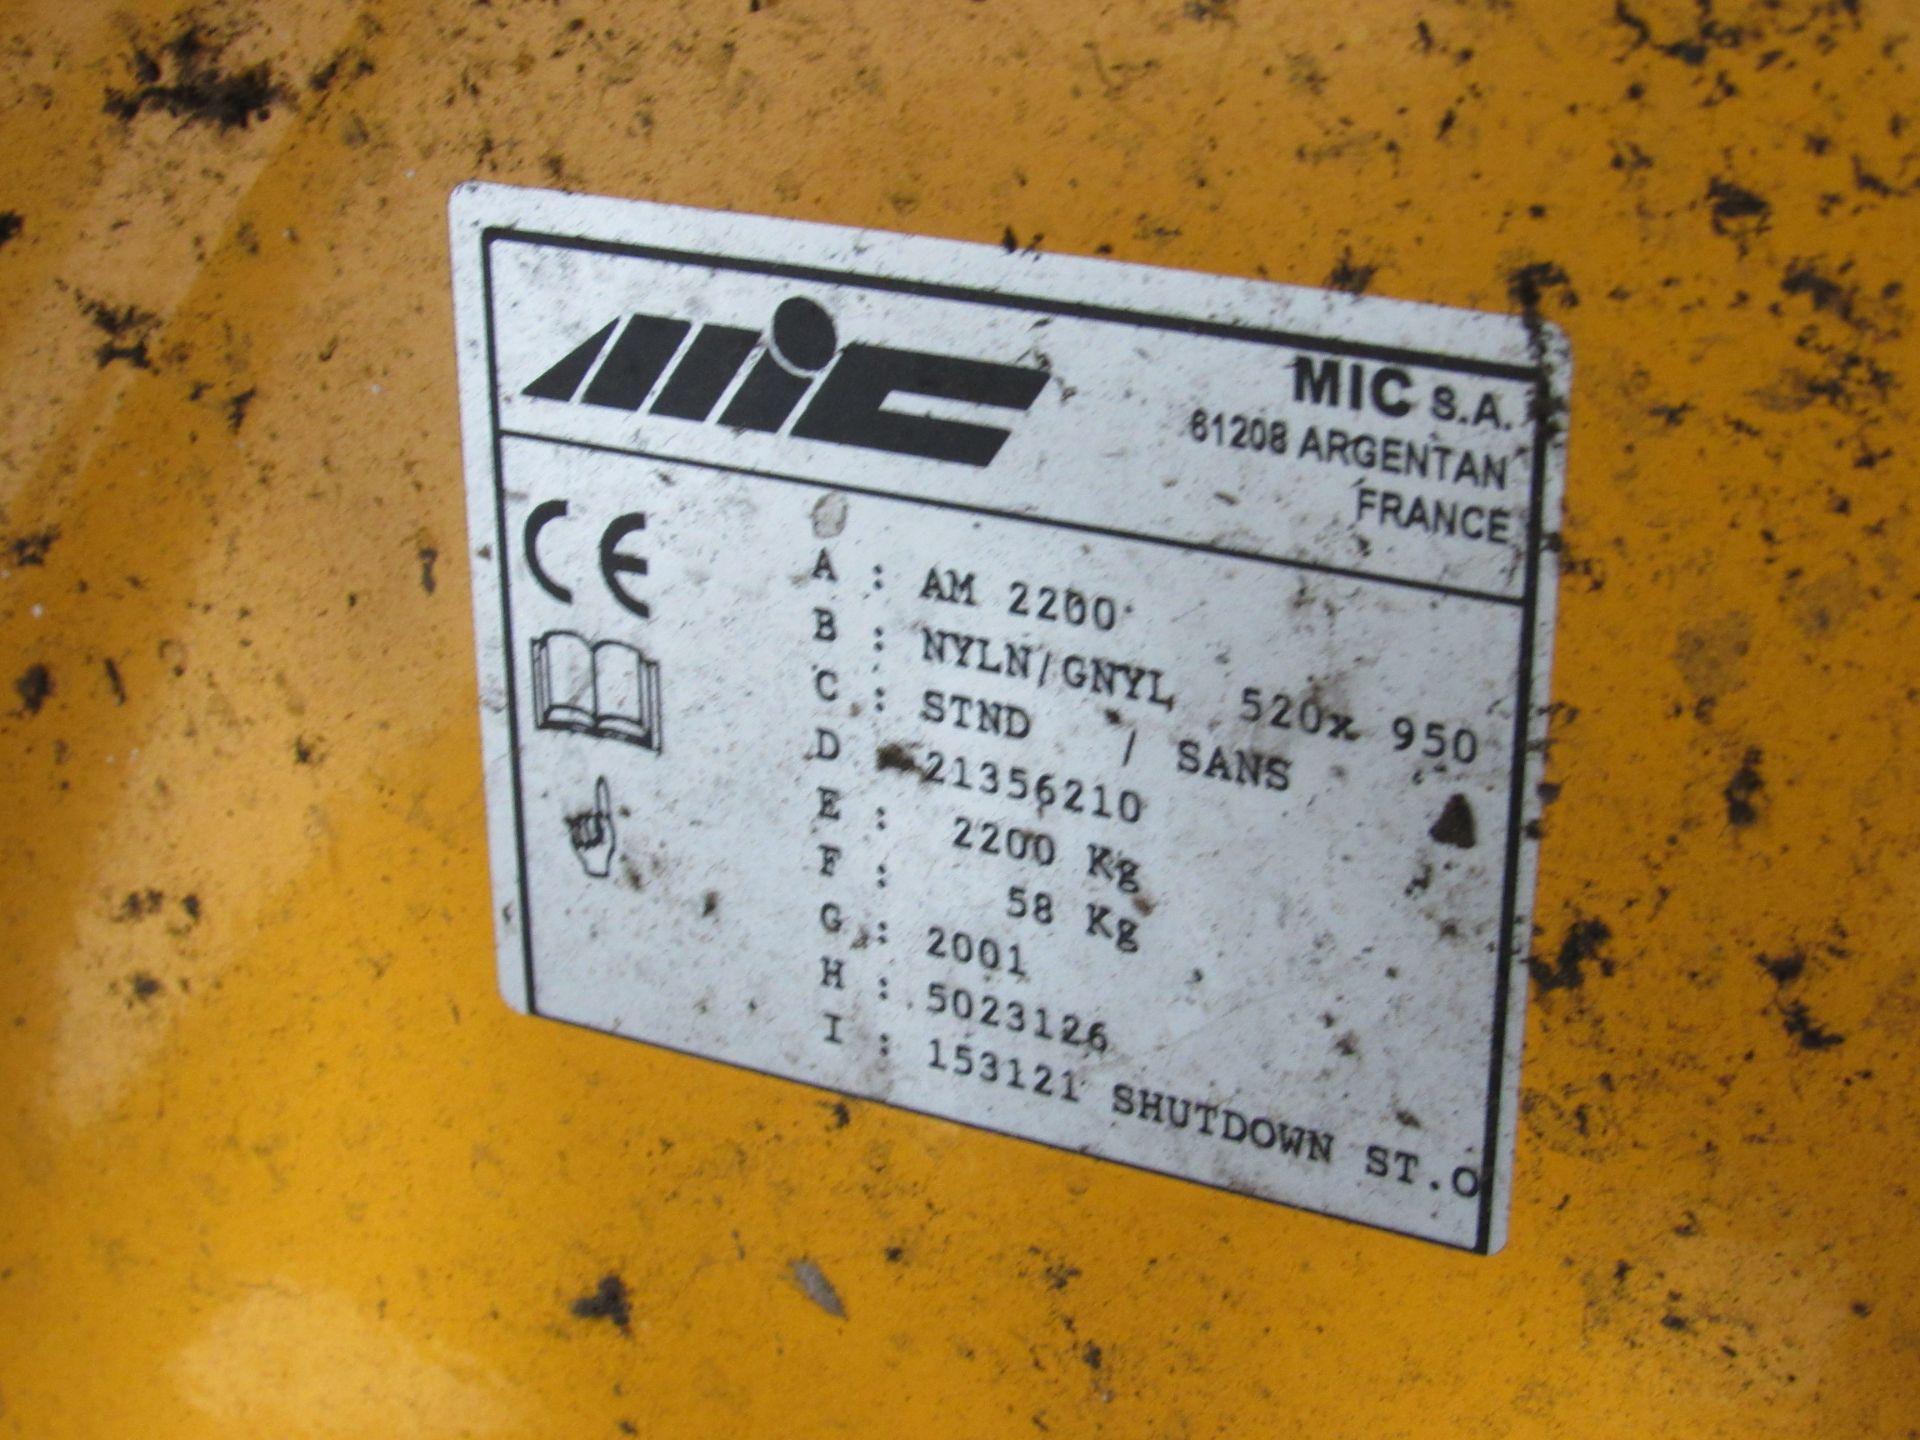 MIC AM2200, 2200Kg Pallet Truck - Image 3 of 3